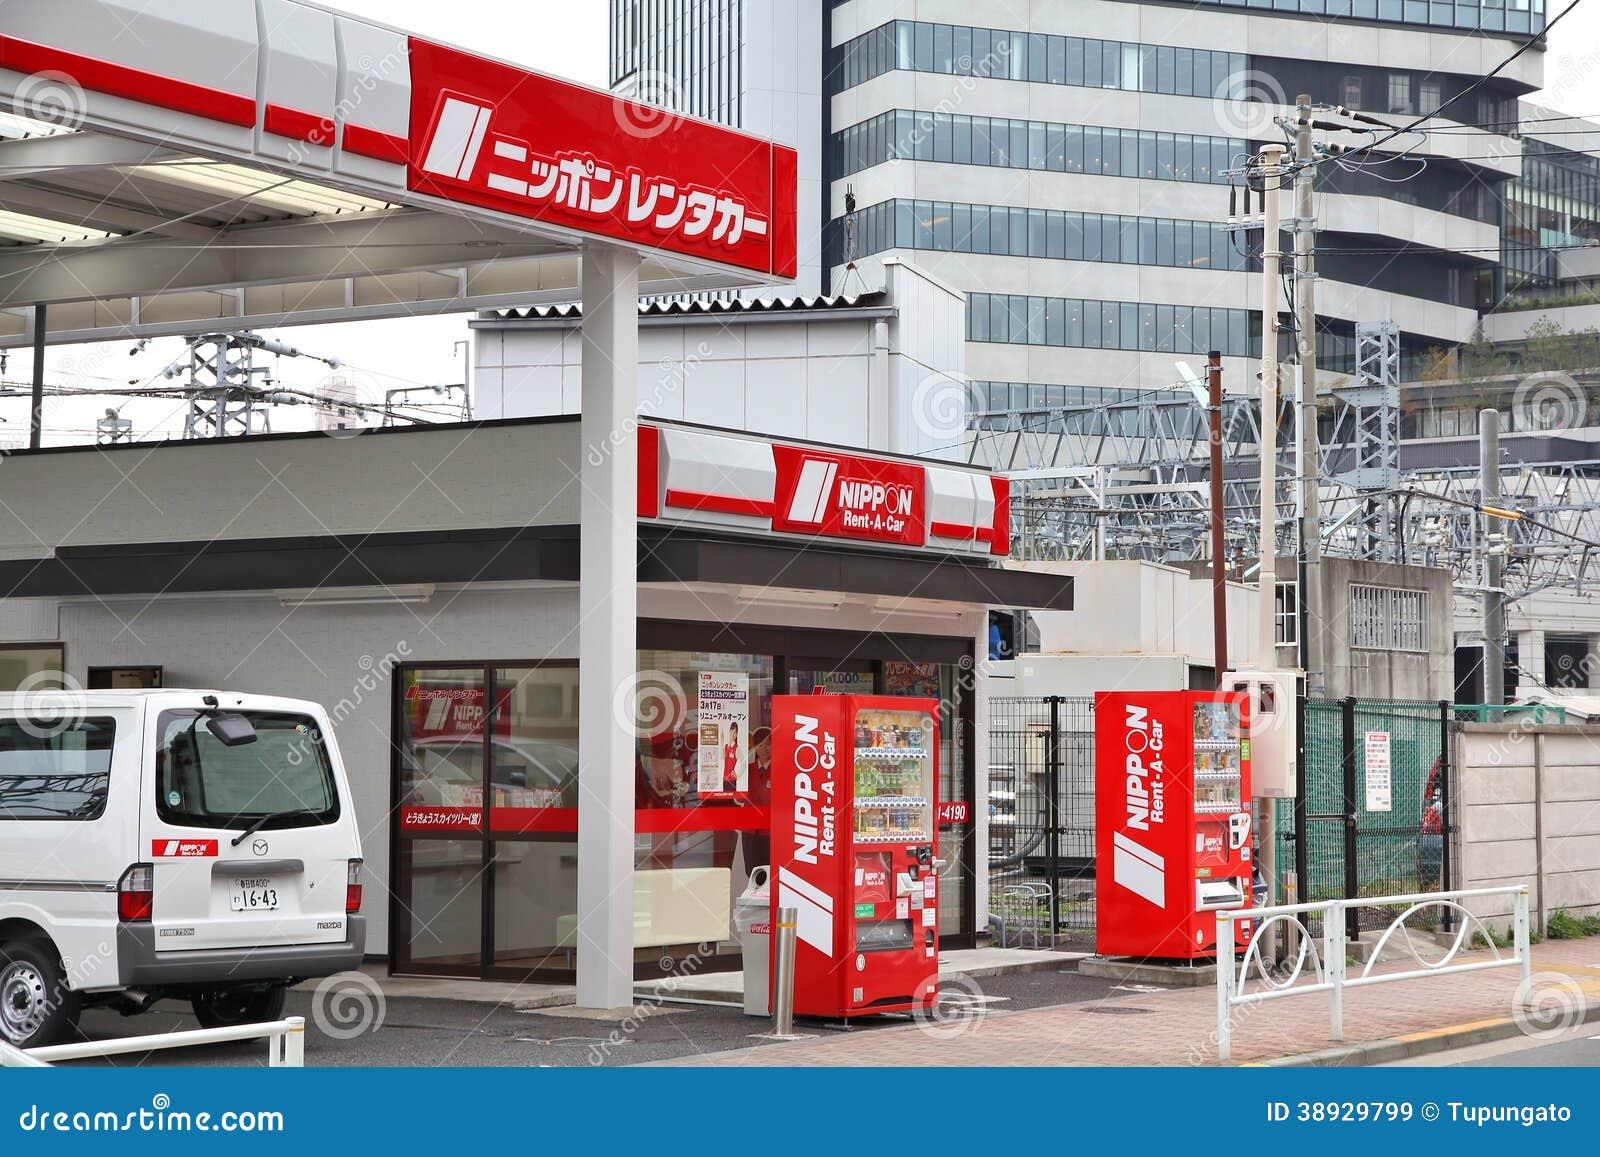 Oldest Japanese Car Company